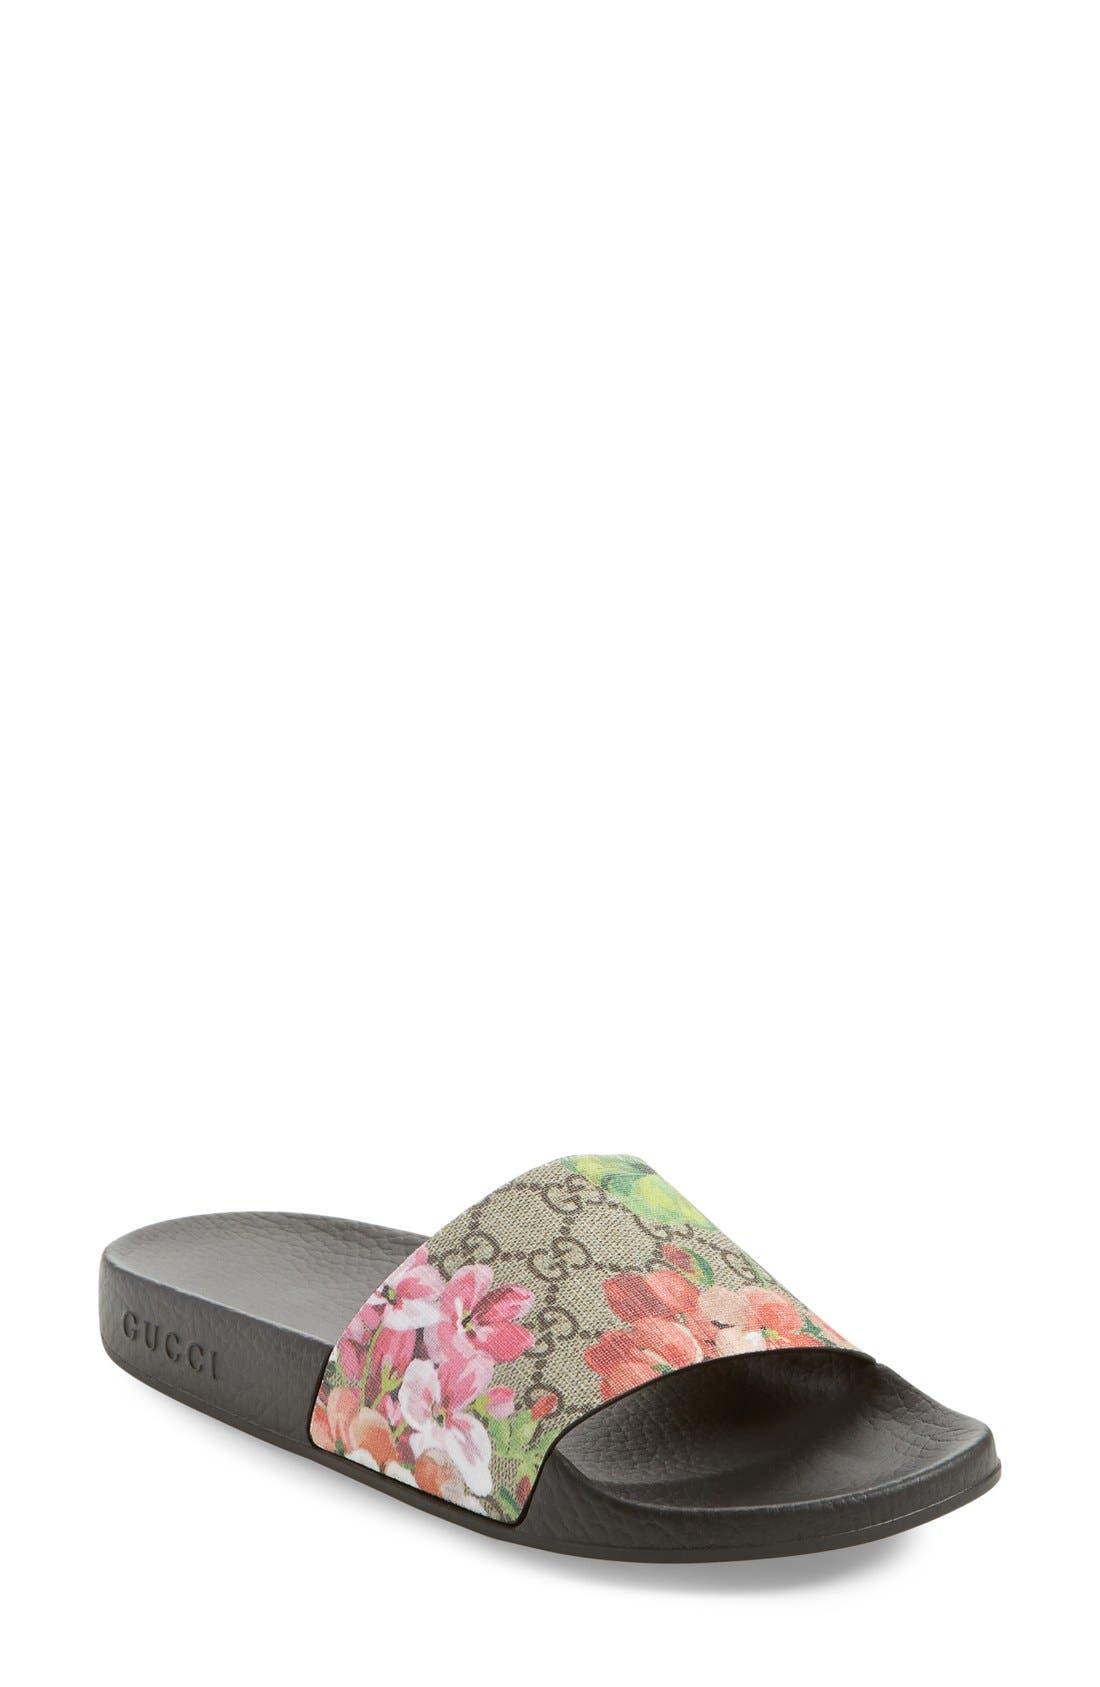 Slide Sandal,                         Main,                         color, MULTI COLOR FABRIC